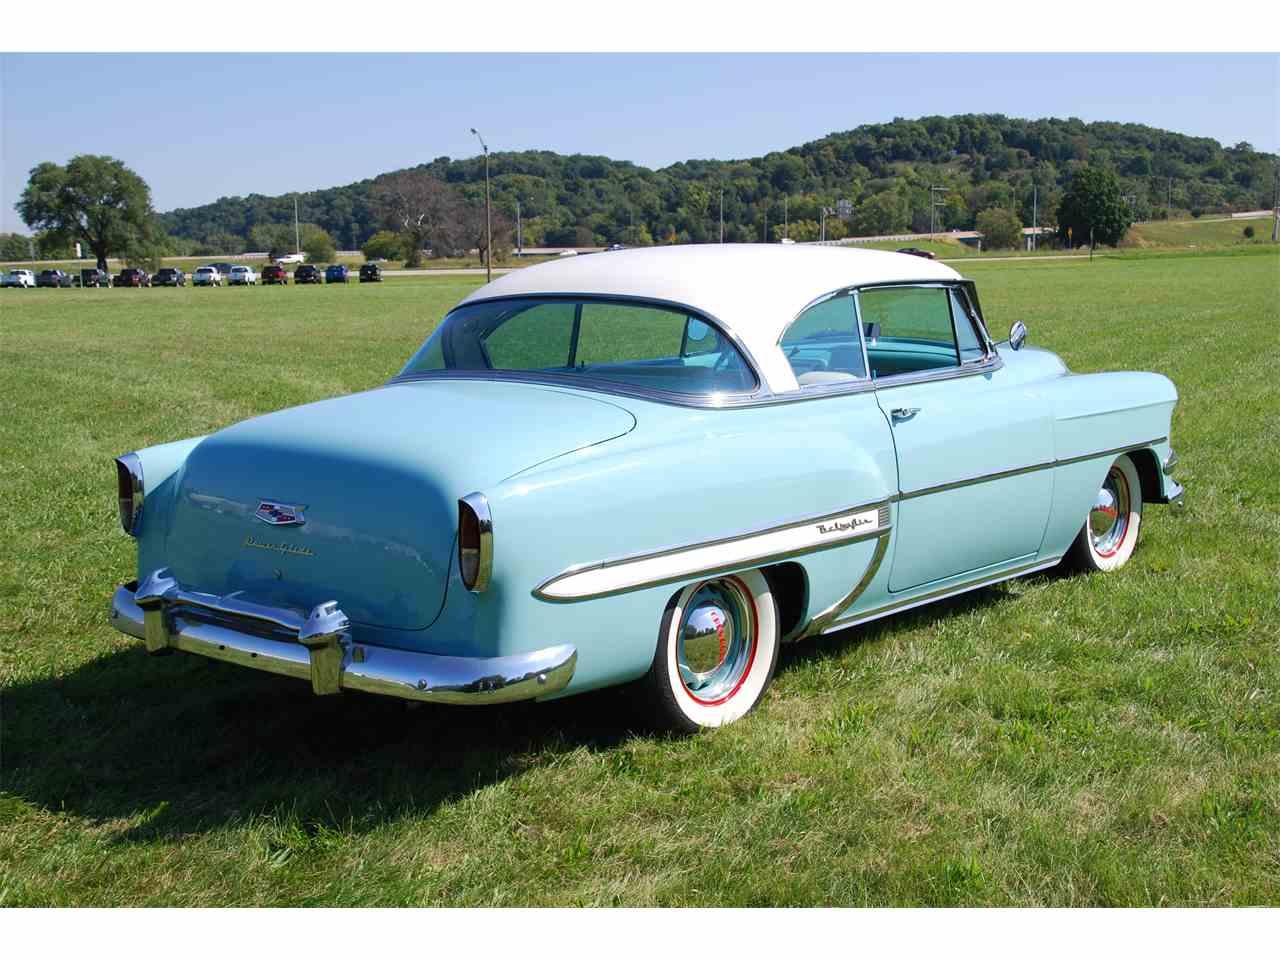 All Chevy 1954 chevrolet belair : 1954 Chevrolet Bel Air for Sale | ClassicCars.com | CC-1010389